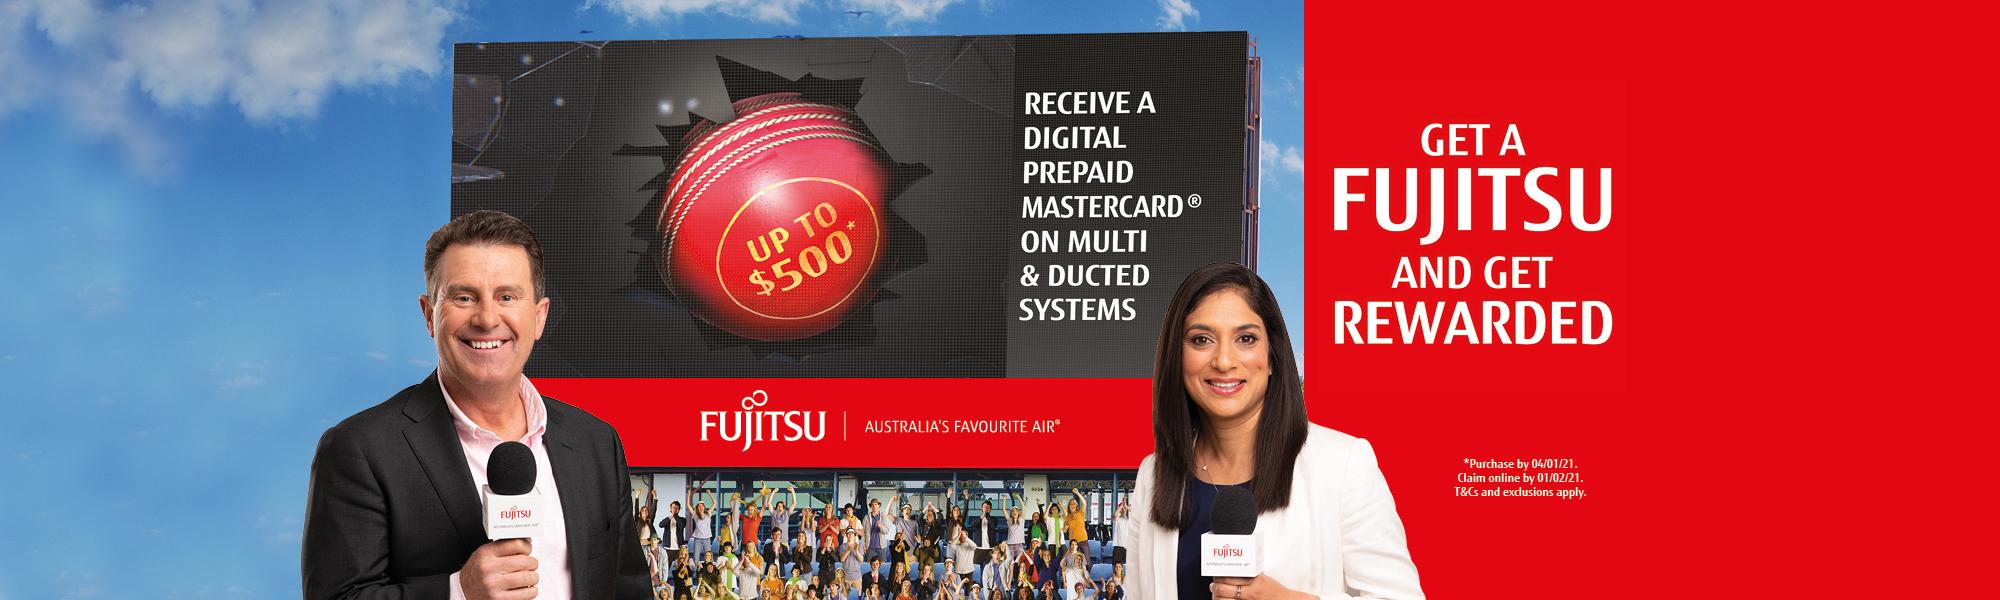 fujitsu-promotion